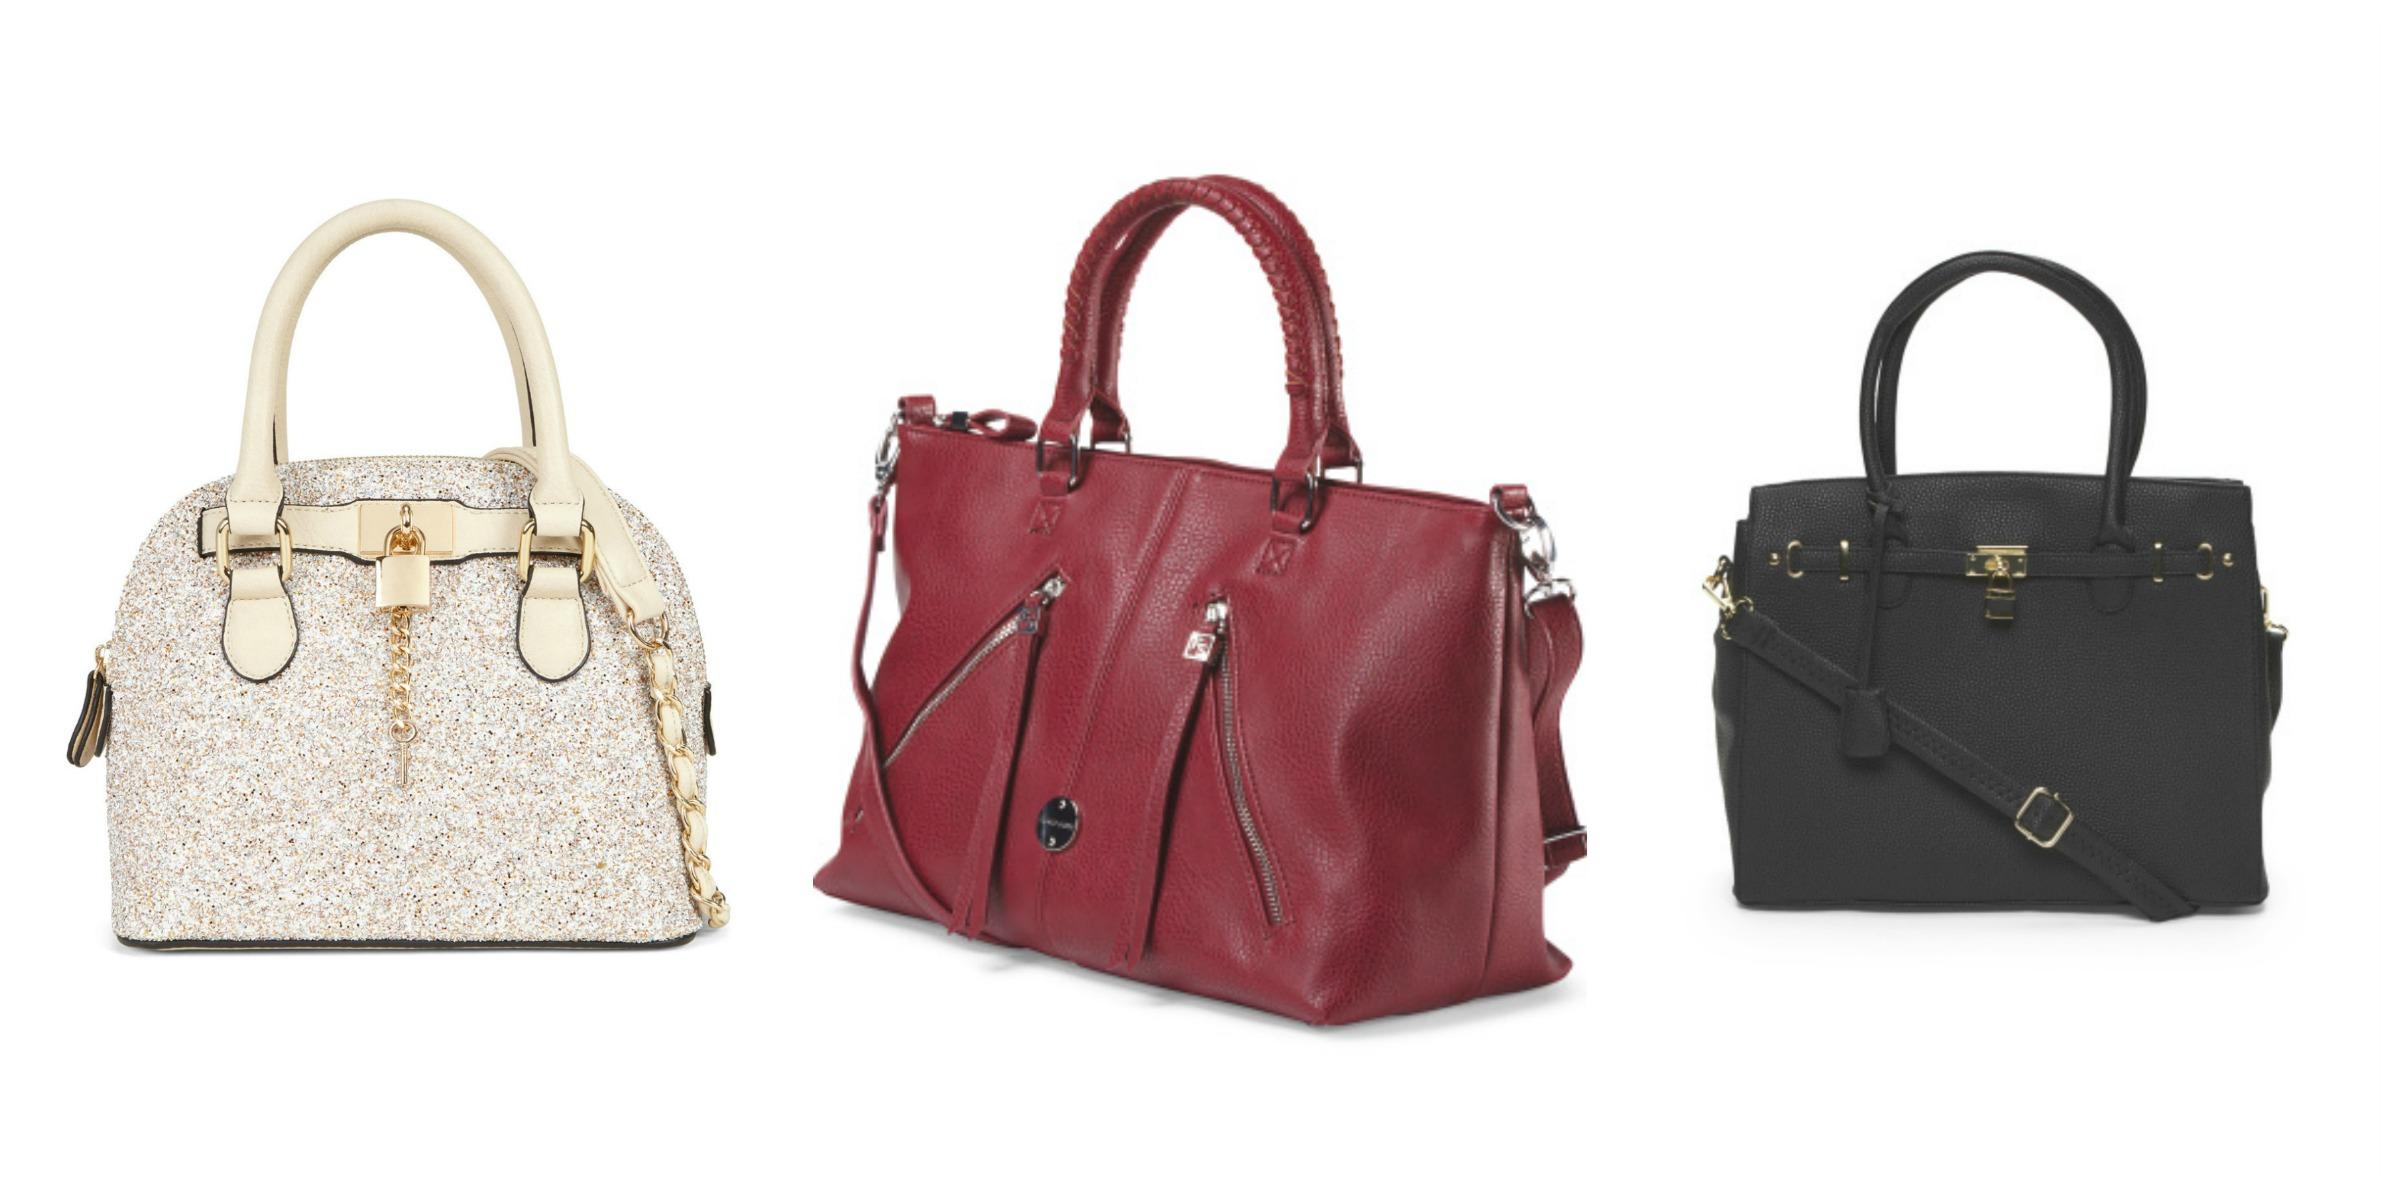 cloie bags - Fall Handbags - Purses Under $50 at WomansDay.com